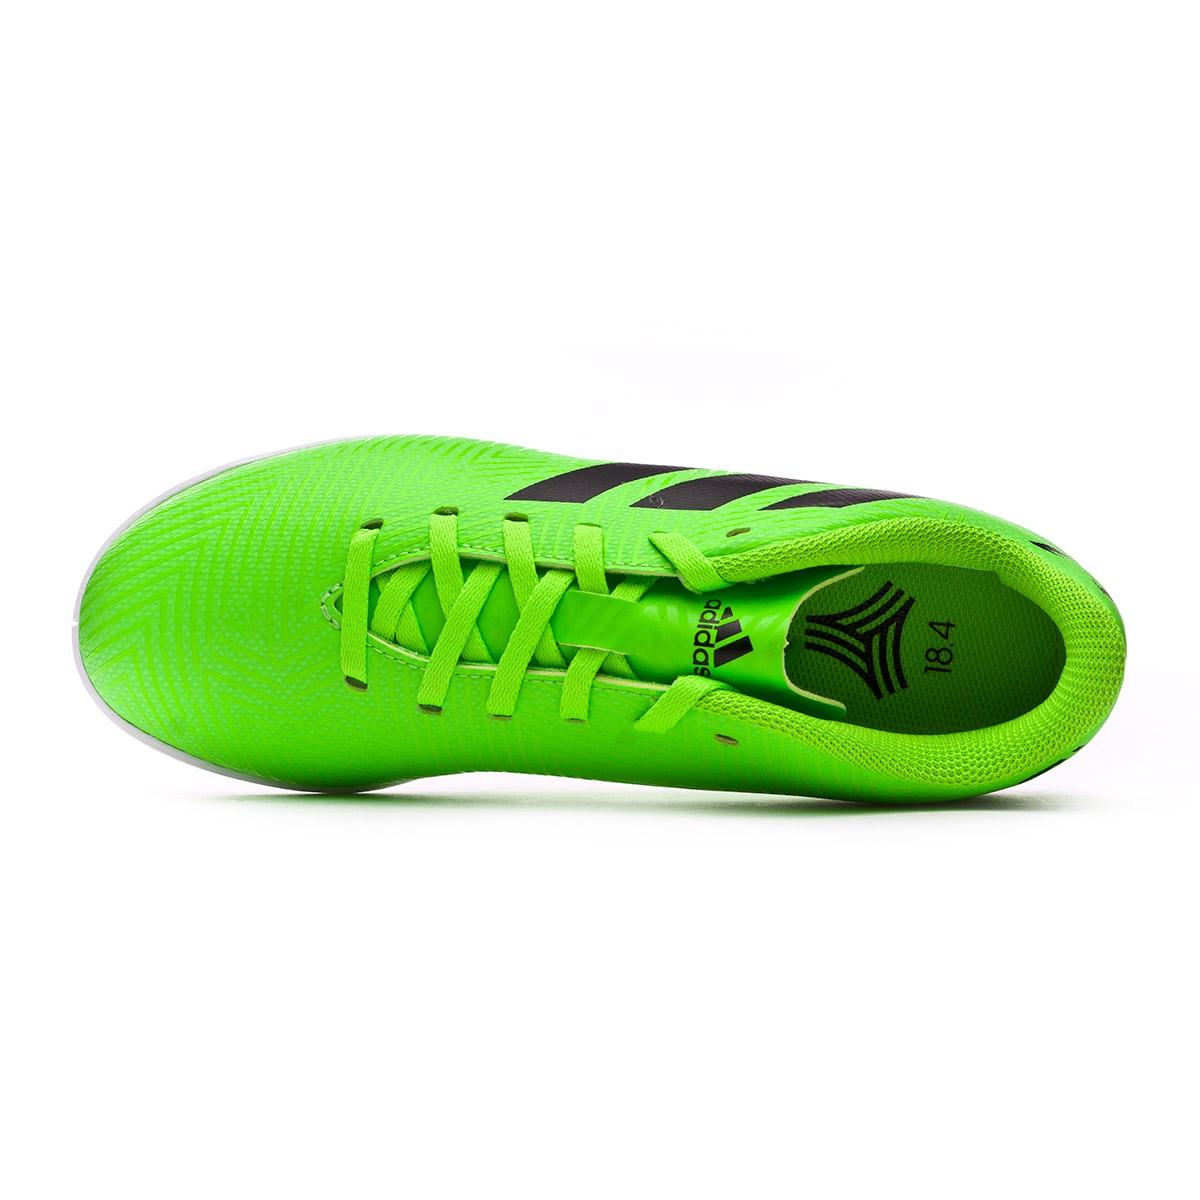 326a3a750a44b Zapatilla adidas Nemeziz Messi Tango 18.4 IN Niño Solar green-Black -  Tienda de fútbol Fútbol Emotion